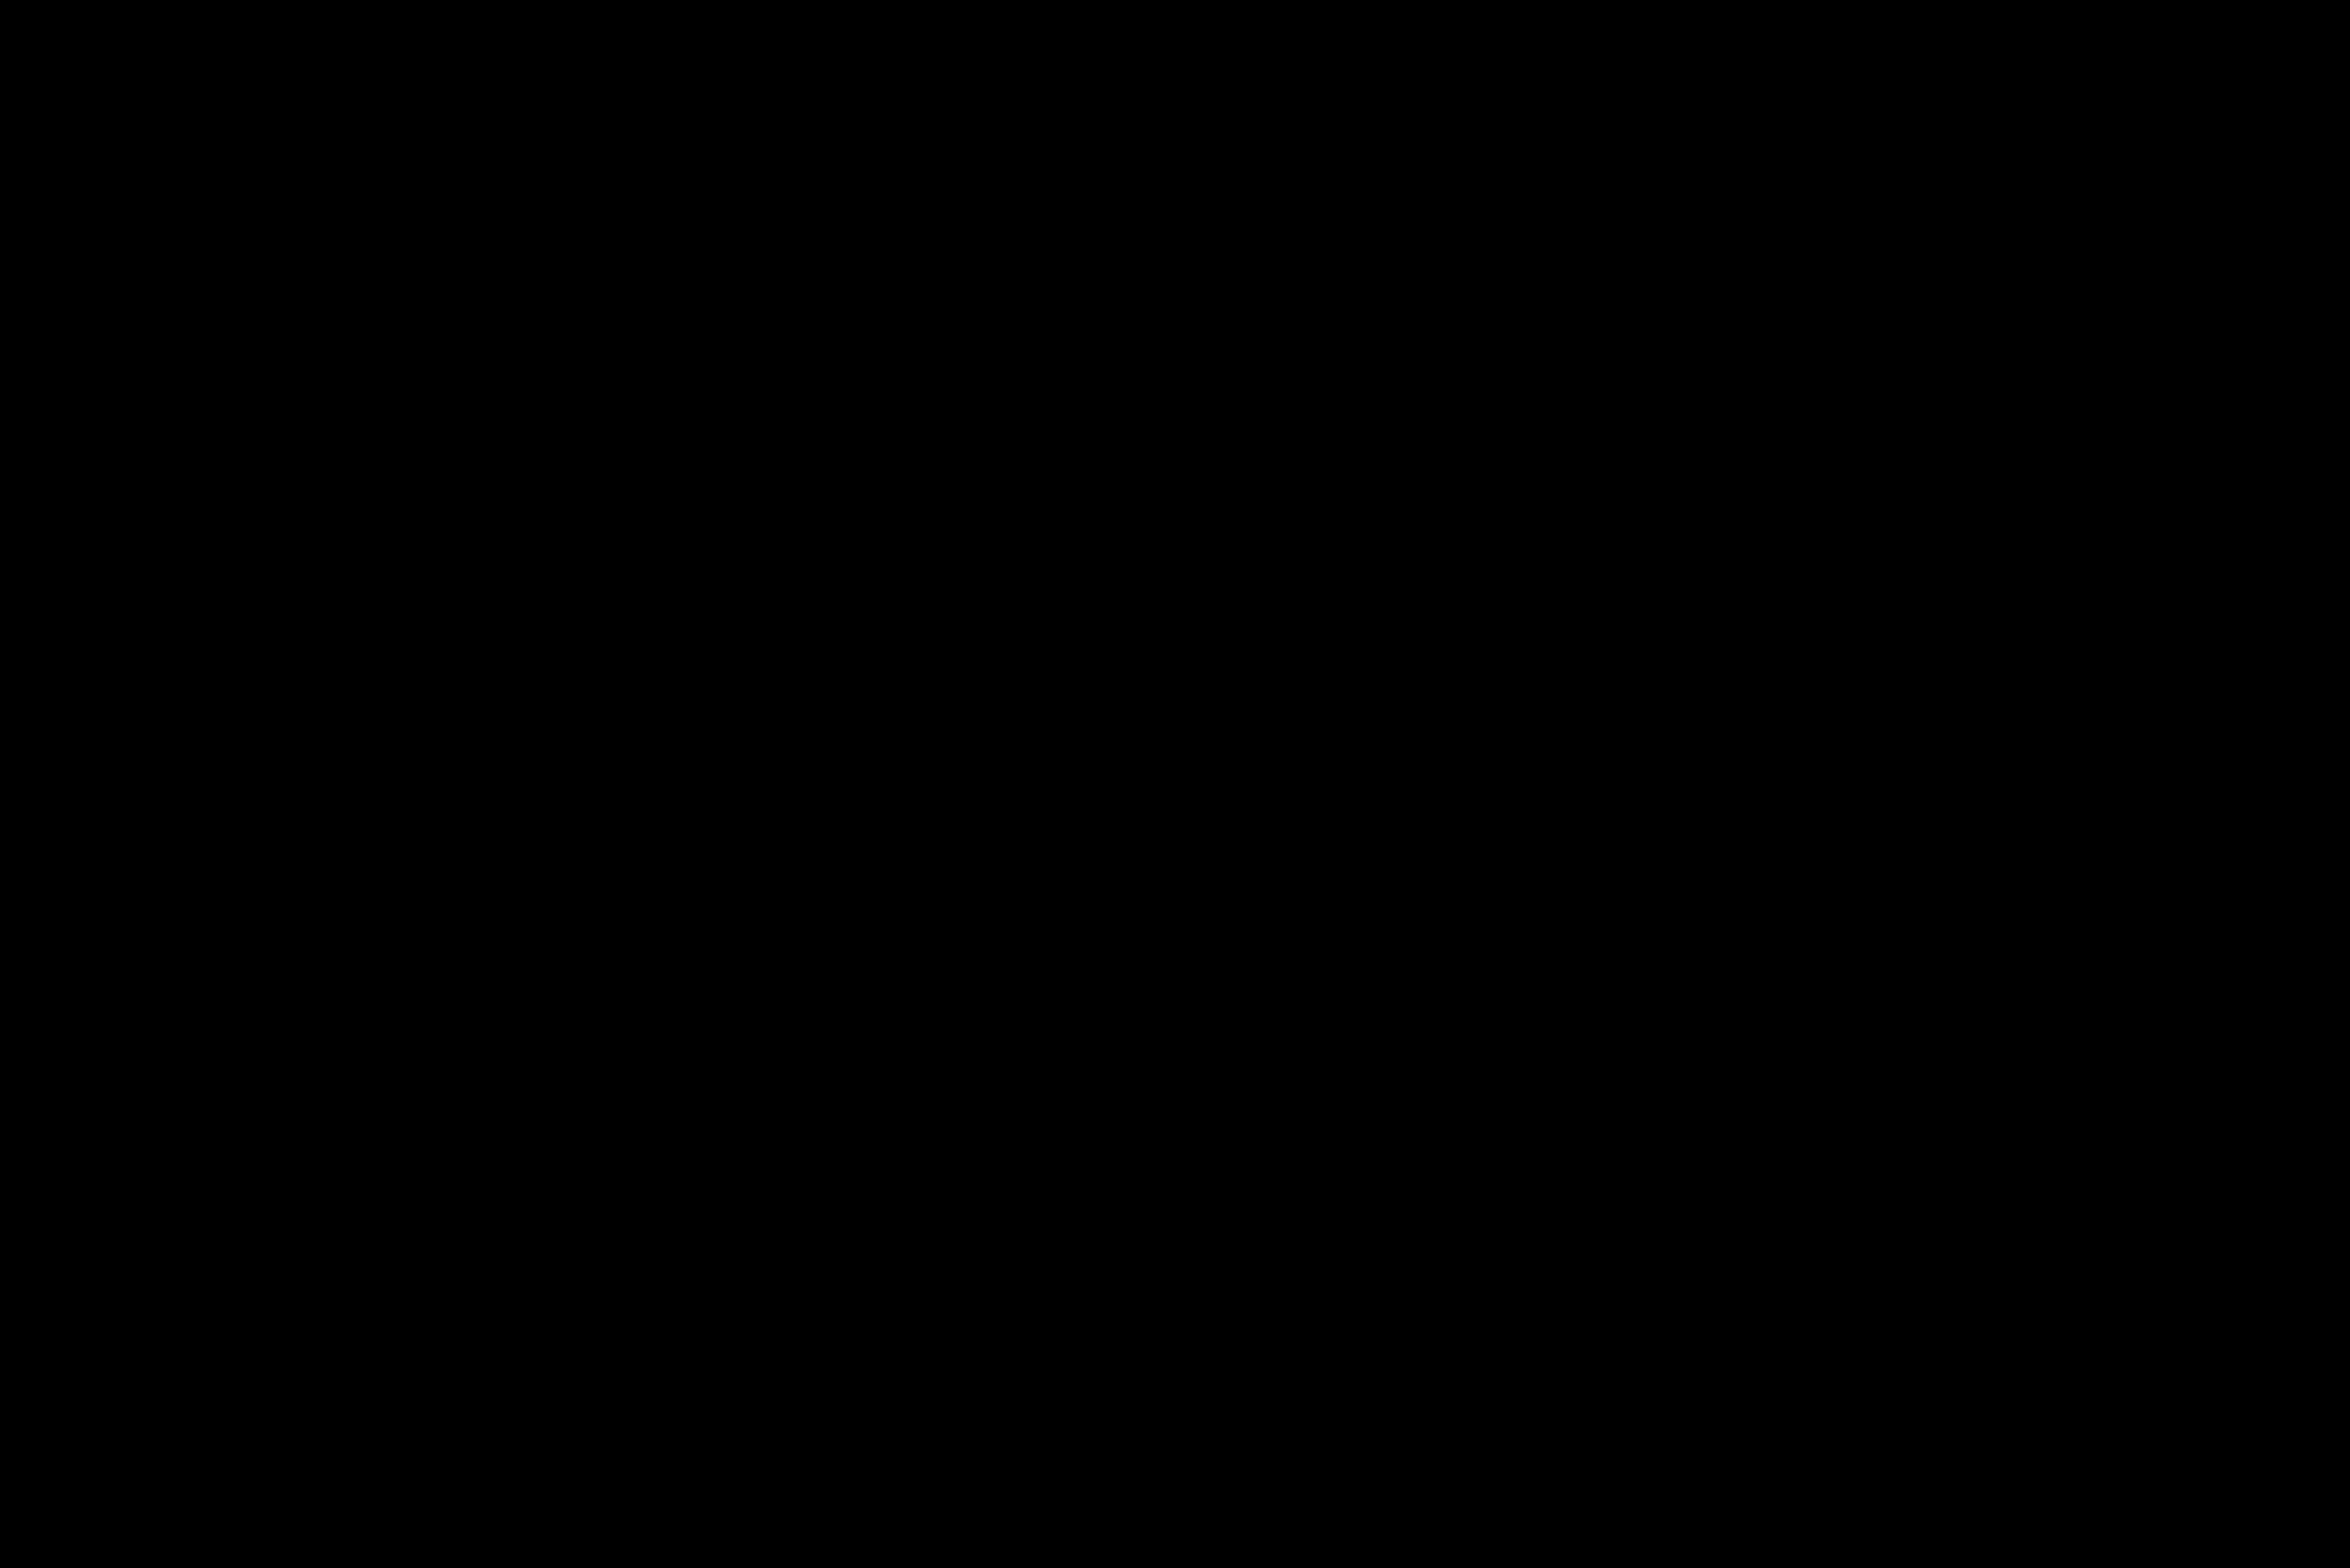 KIT ADMISIÓN CARBONO AMS PERFORMANCE (EDICIÓN ESPECIAL) AUDI S3 8V | SEAT LEON CUPRA 5F | SKODA OCTAVIA 5E vRS| VOLKSWAGEN GOLF VII GTI – R